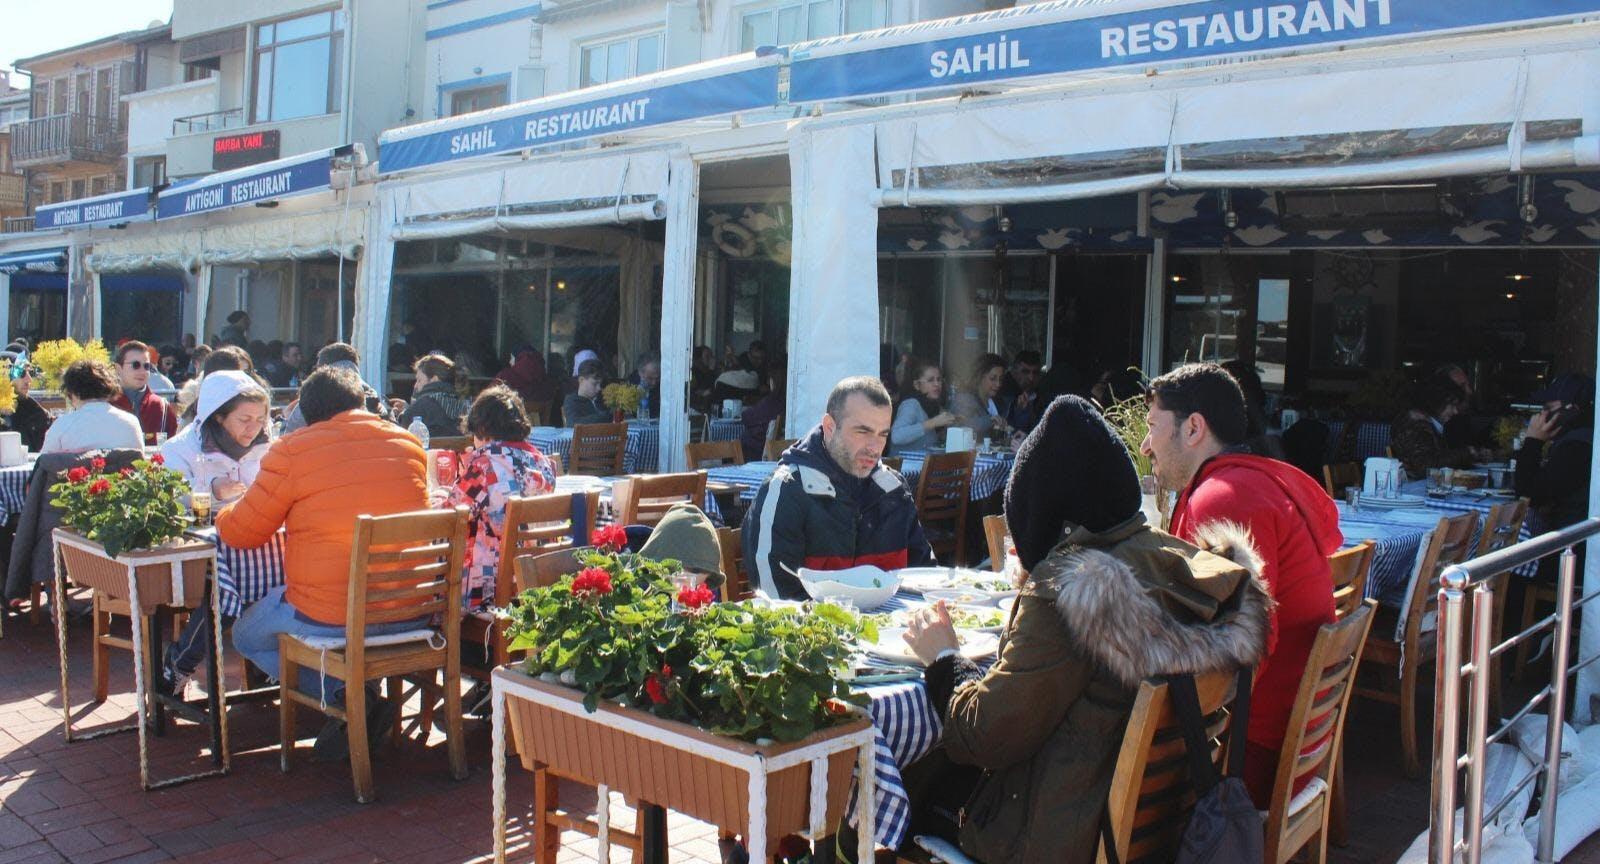 Photo of restaurant Sahil Restaurant Burgazada in Burgazada, Istanbul